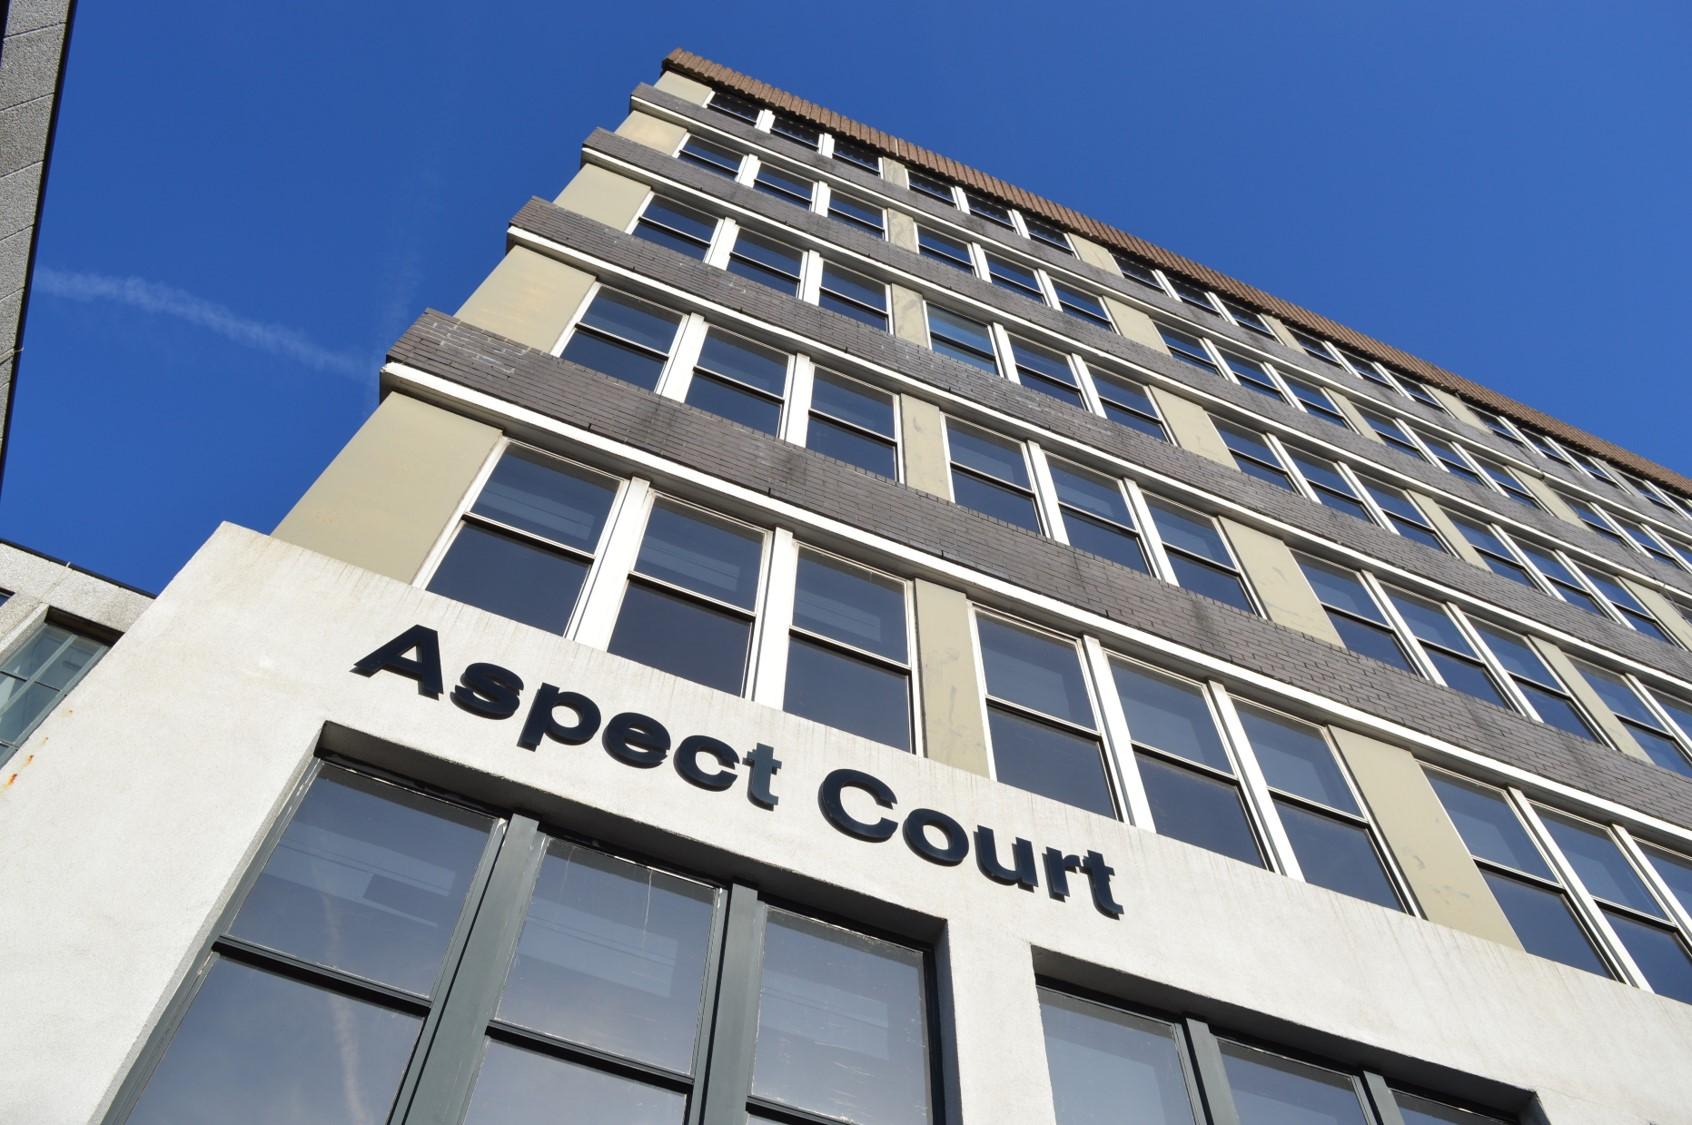 Aspect Court Sheffield Hallam University